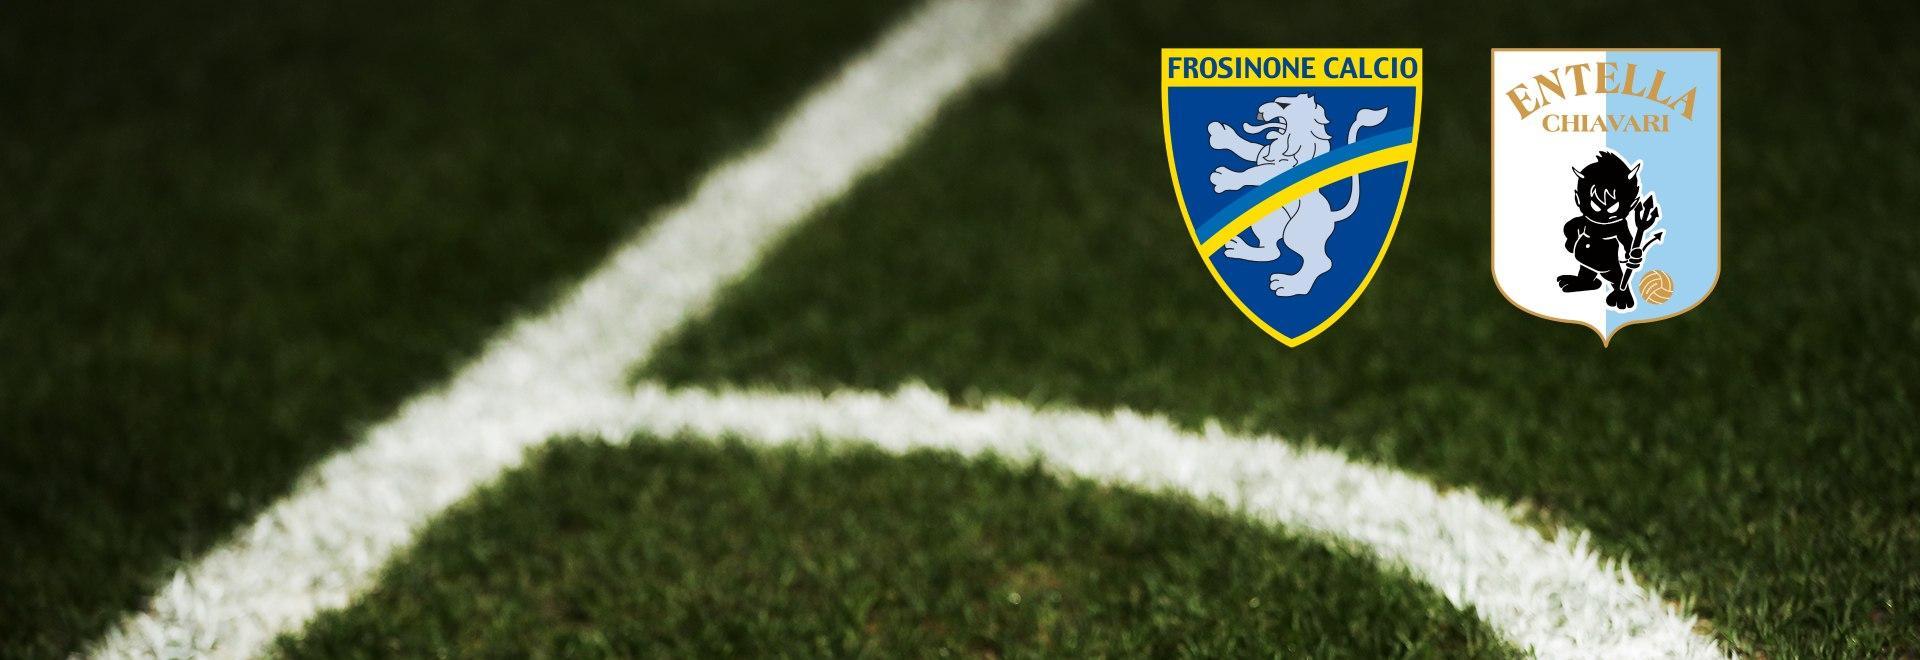 Frosinone - Virtus Entella. 22a g.